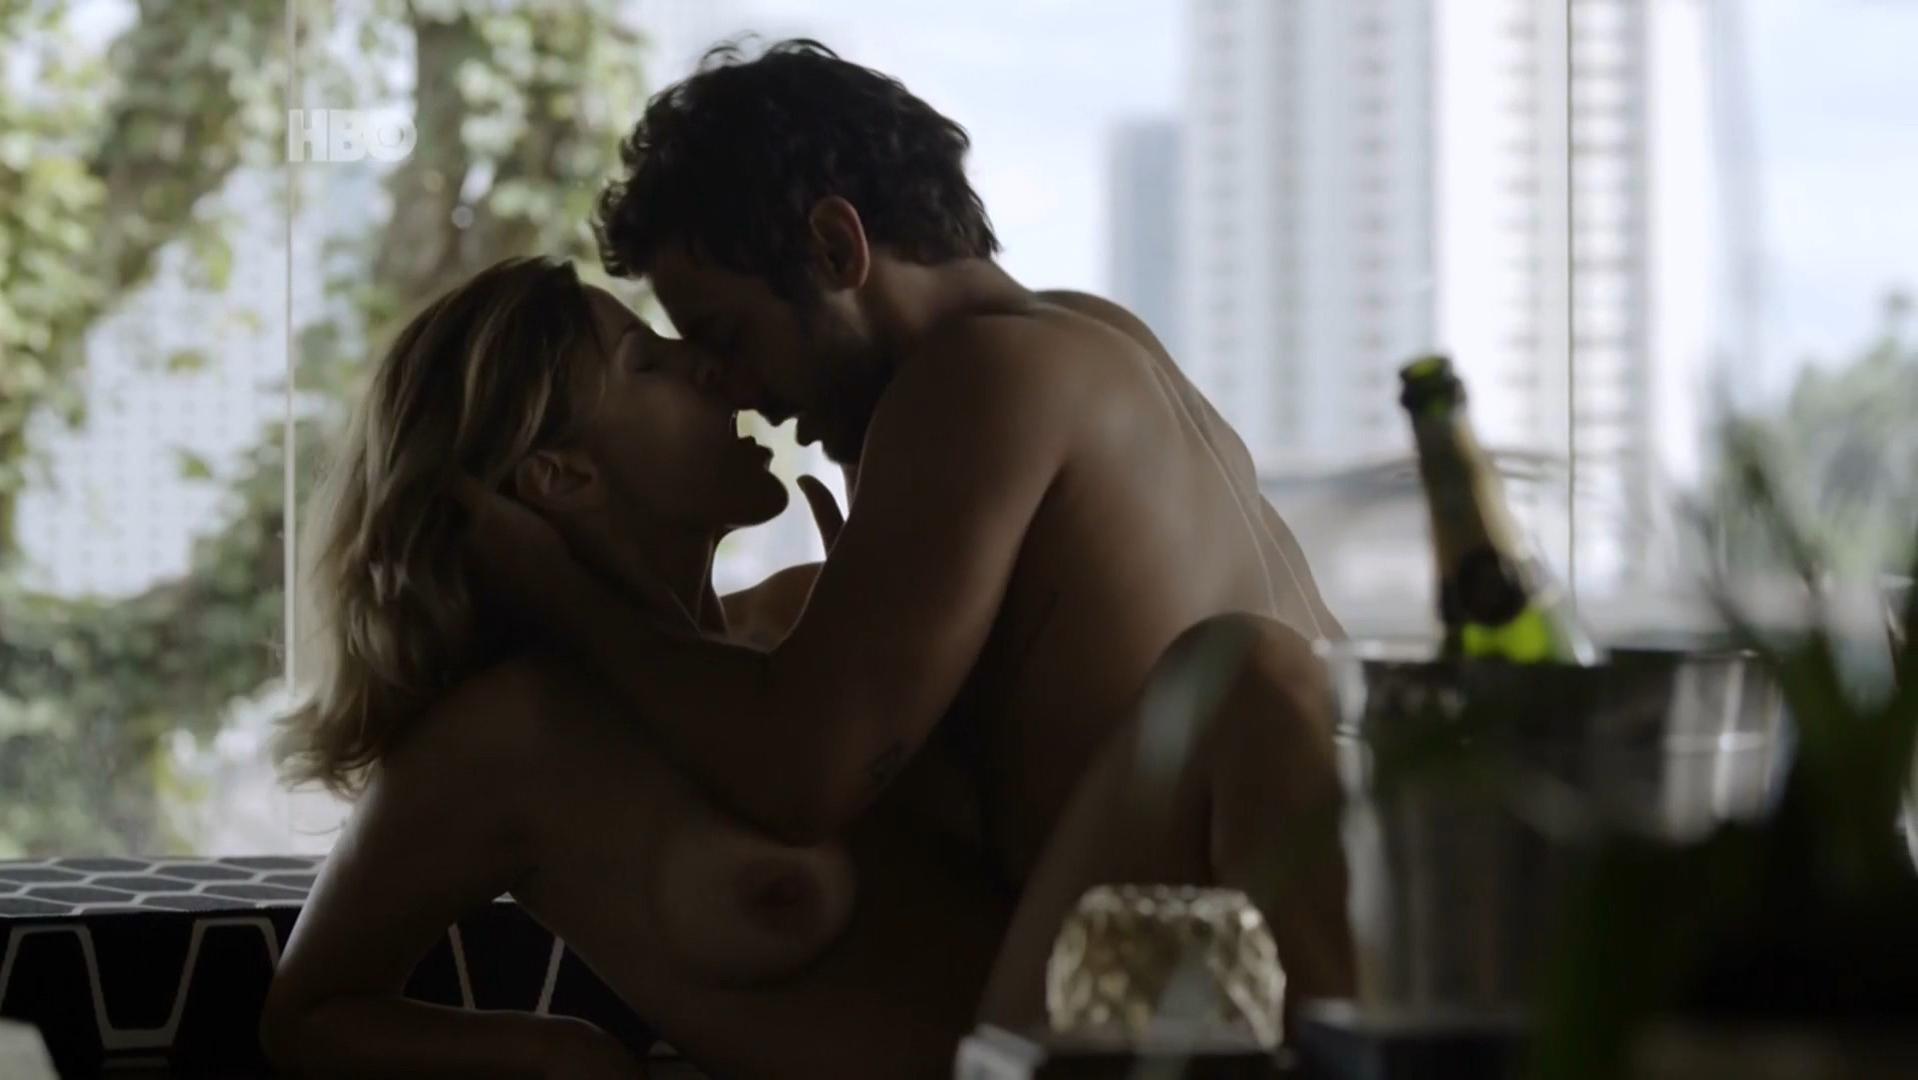 Antoniela Canto nude - O Negocio s02 (2014)